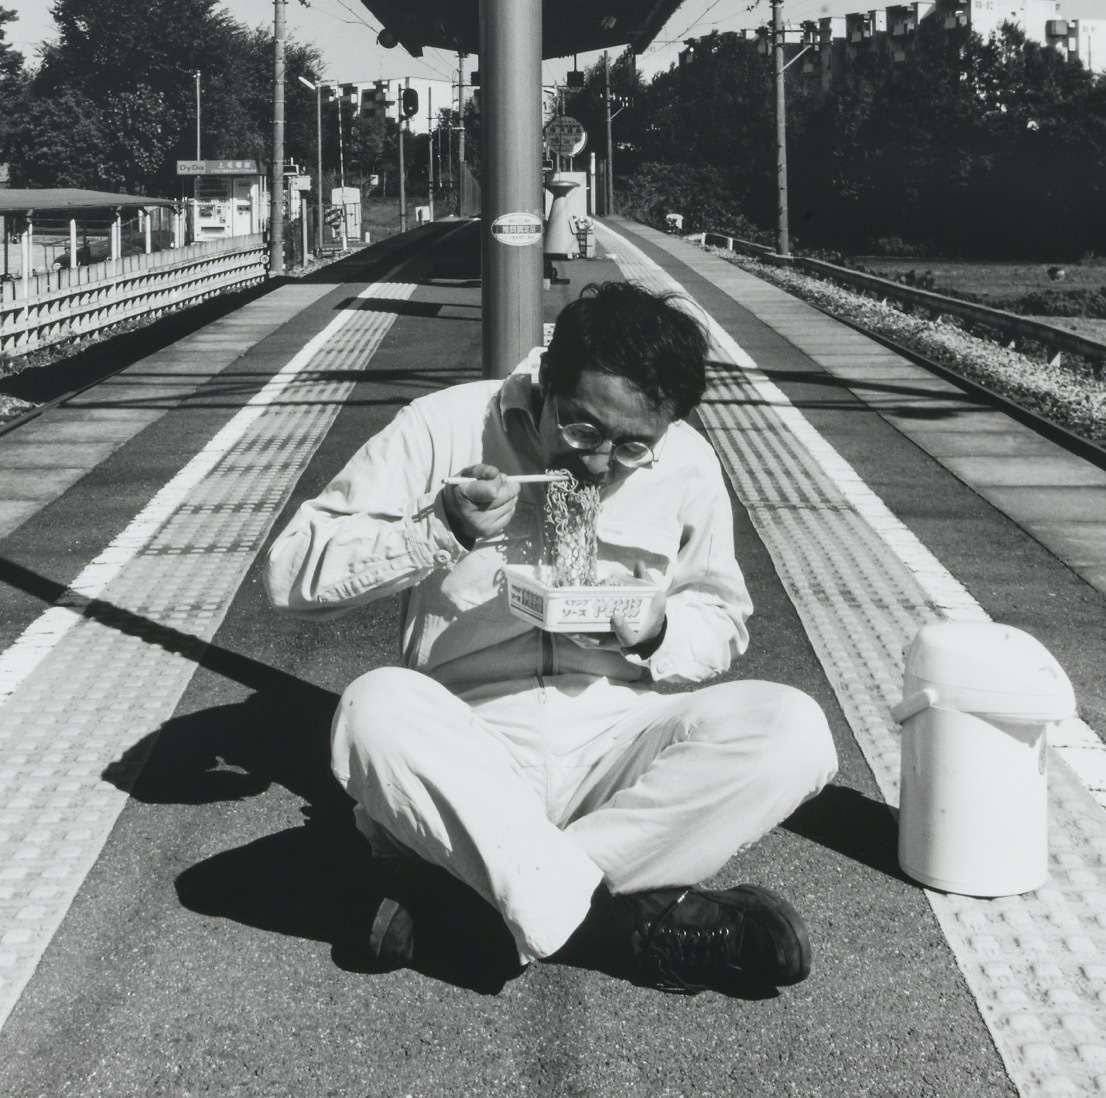 Yoshio Shirakawa, Action at Unmanned Stations (Gunma and Food), 2000, Photo © Shinya Kigure